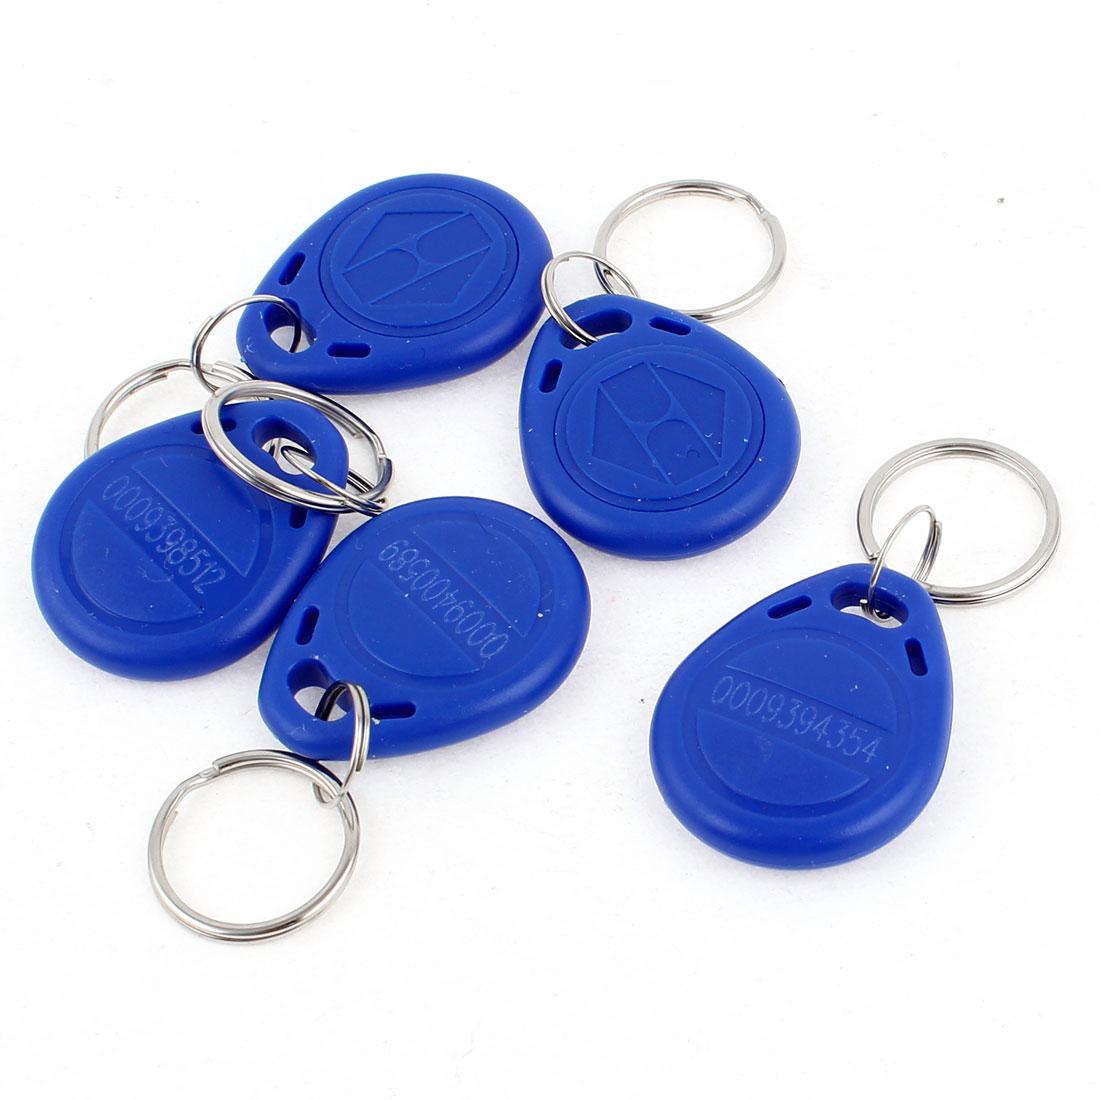 5Pcs Blue EM4100 125Khz Rfid Proximity Door Control ID Card Token Tag Keychains